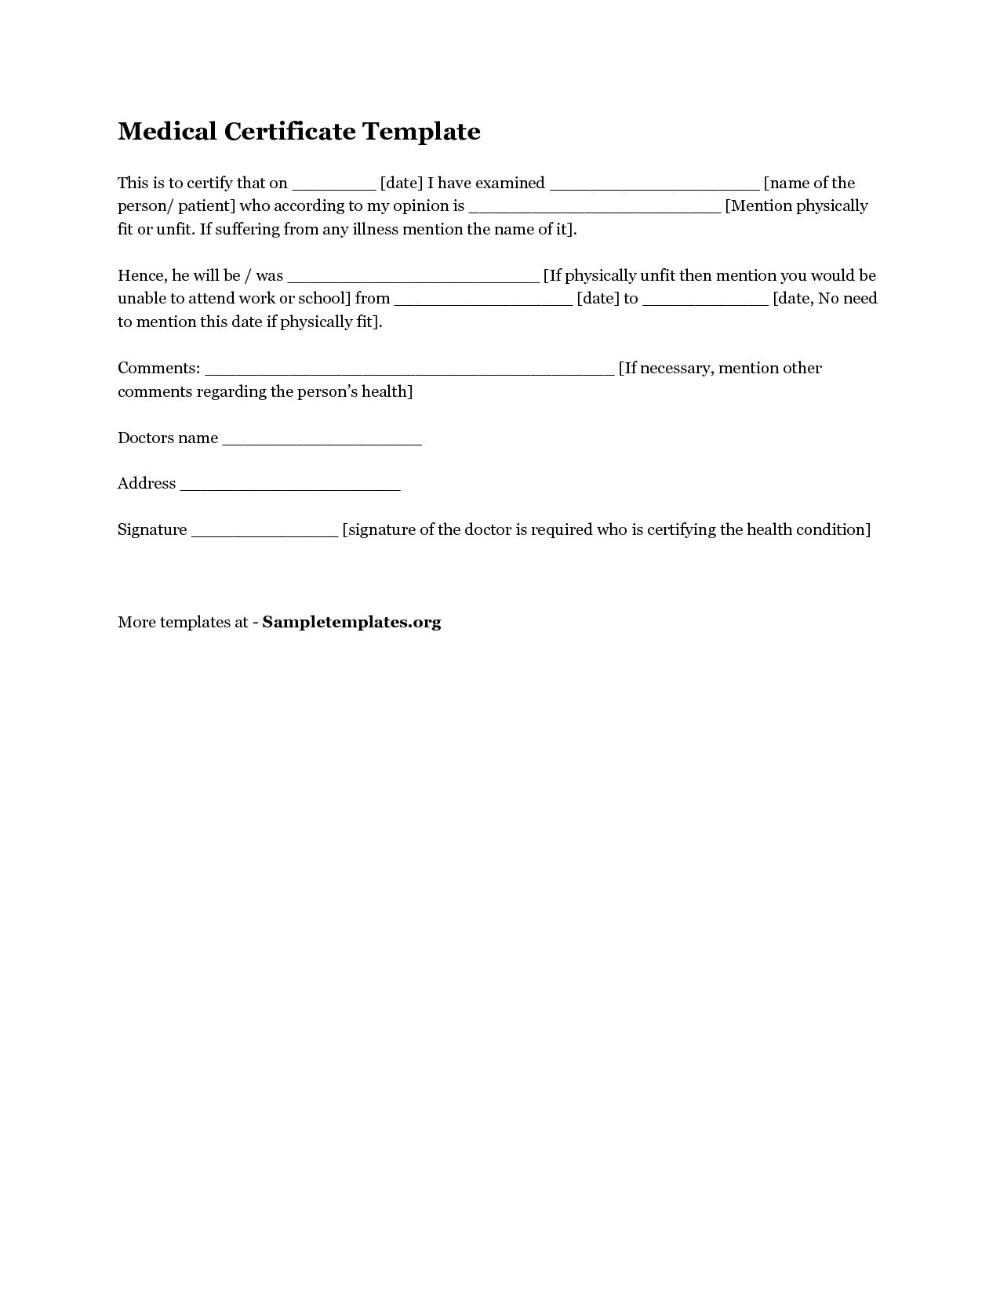 Medical Certificate Example Australia Regarding Australian